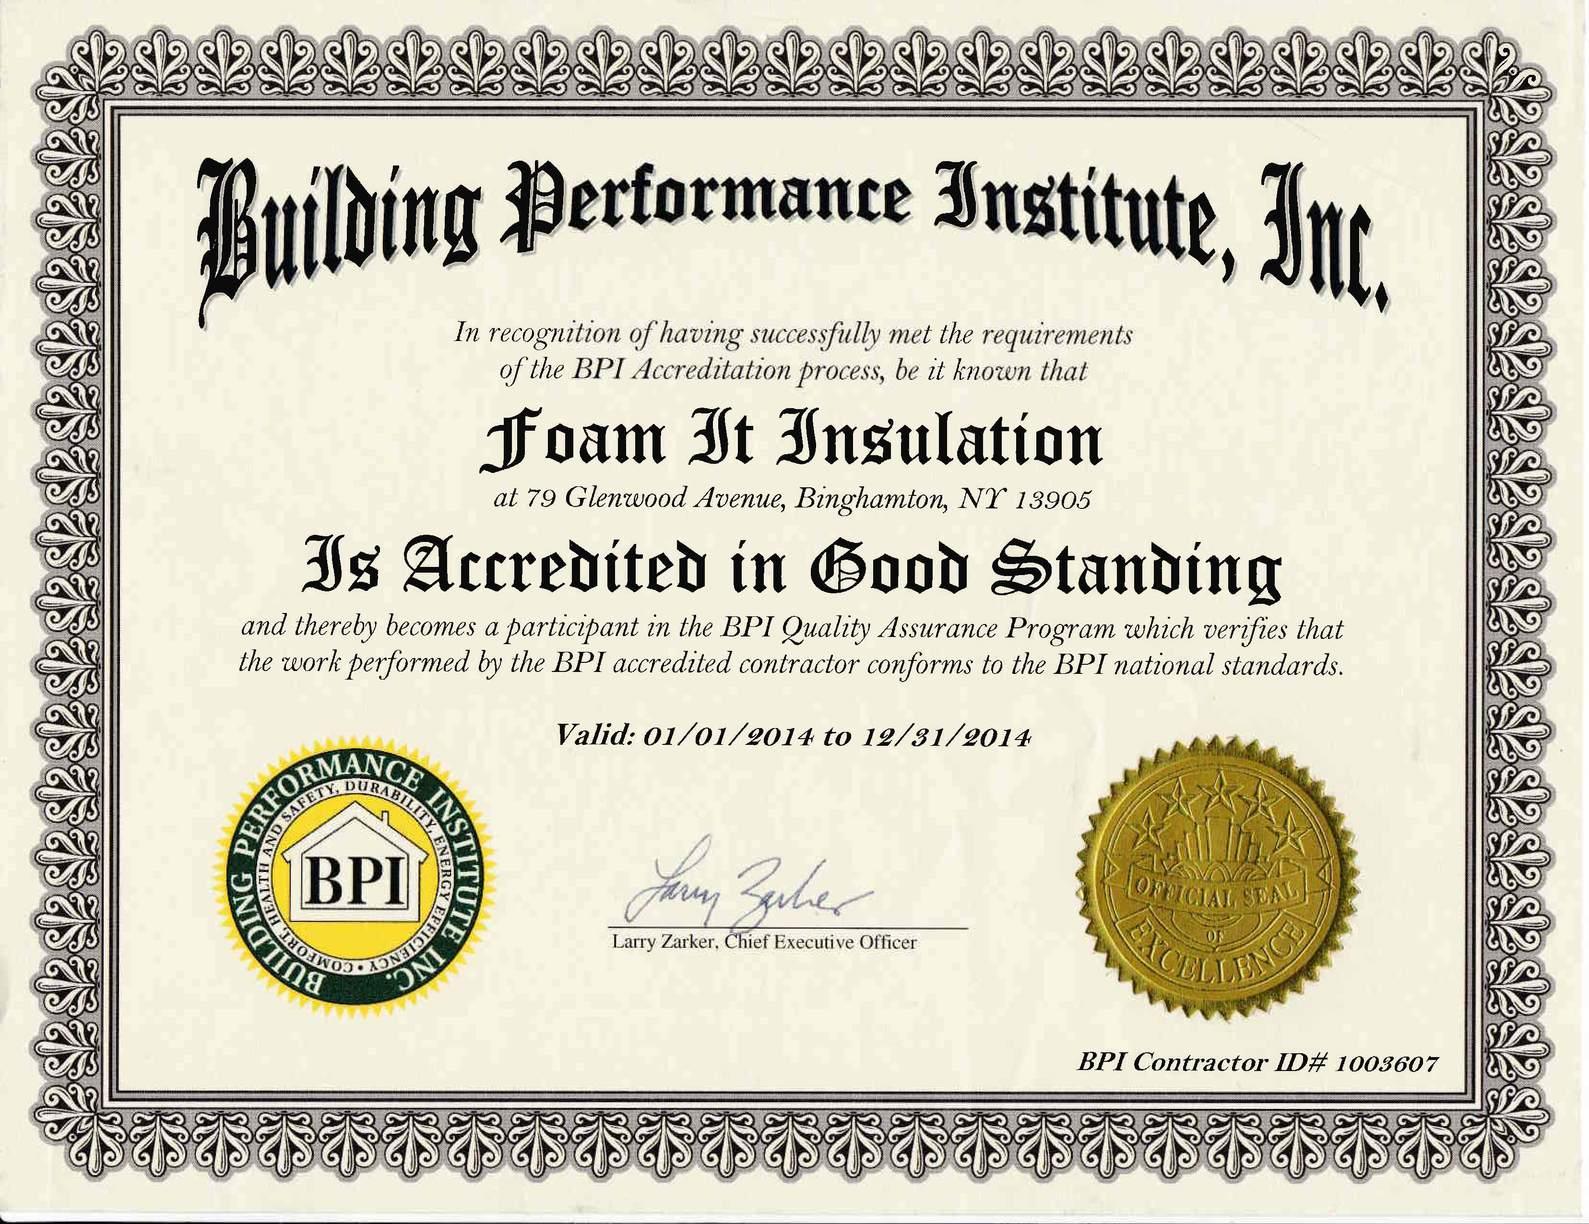 Building Performance Institute 2014 Accreditation Certificate